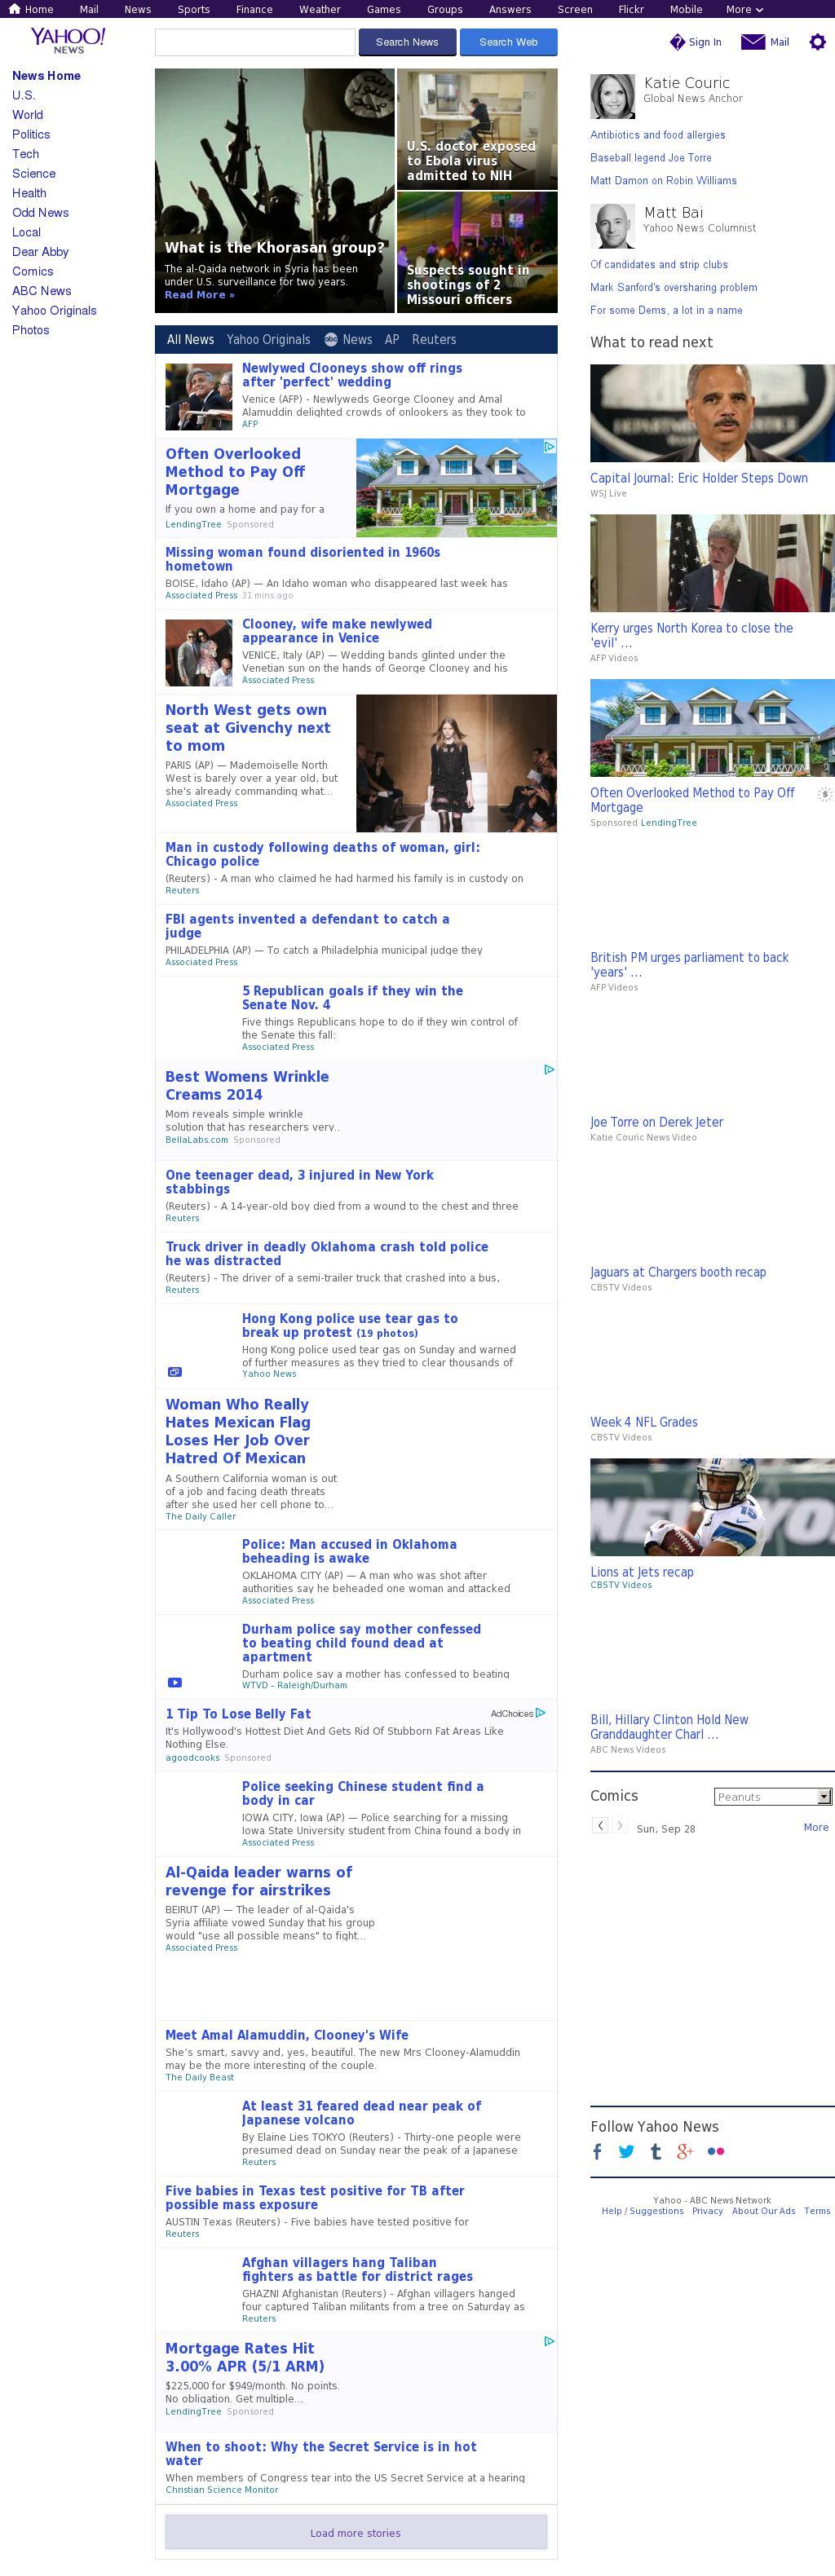 Yahoo! News at Monday Sept. 29, 2014, 1:22 a.m. UTC